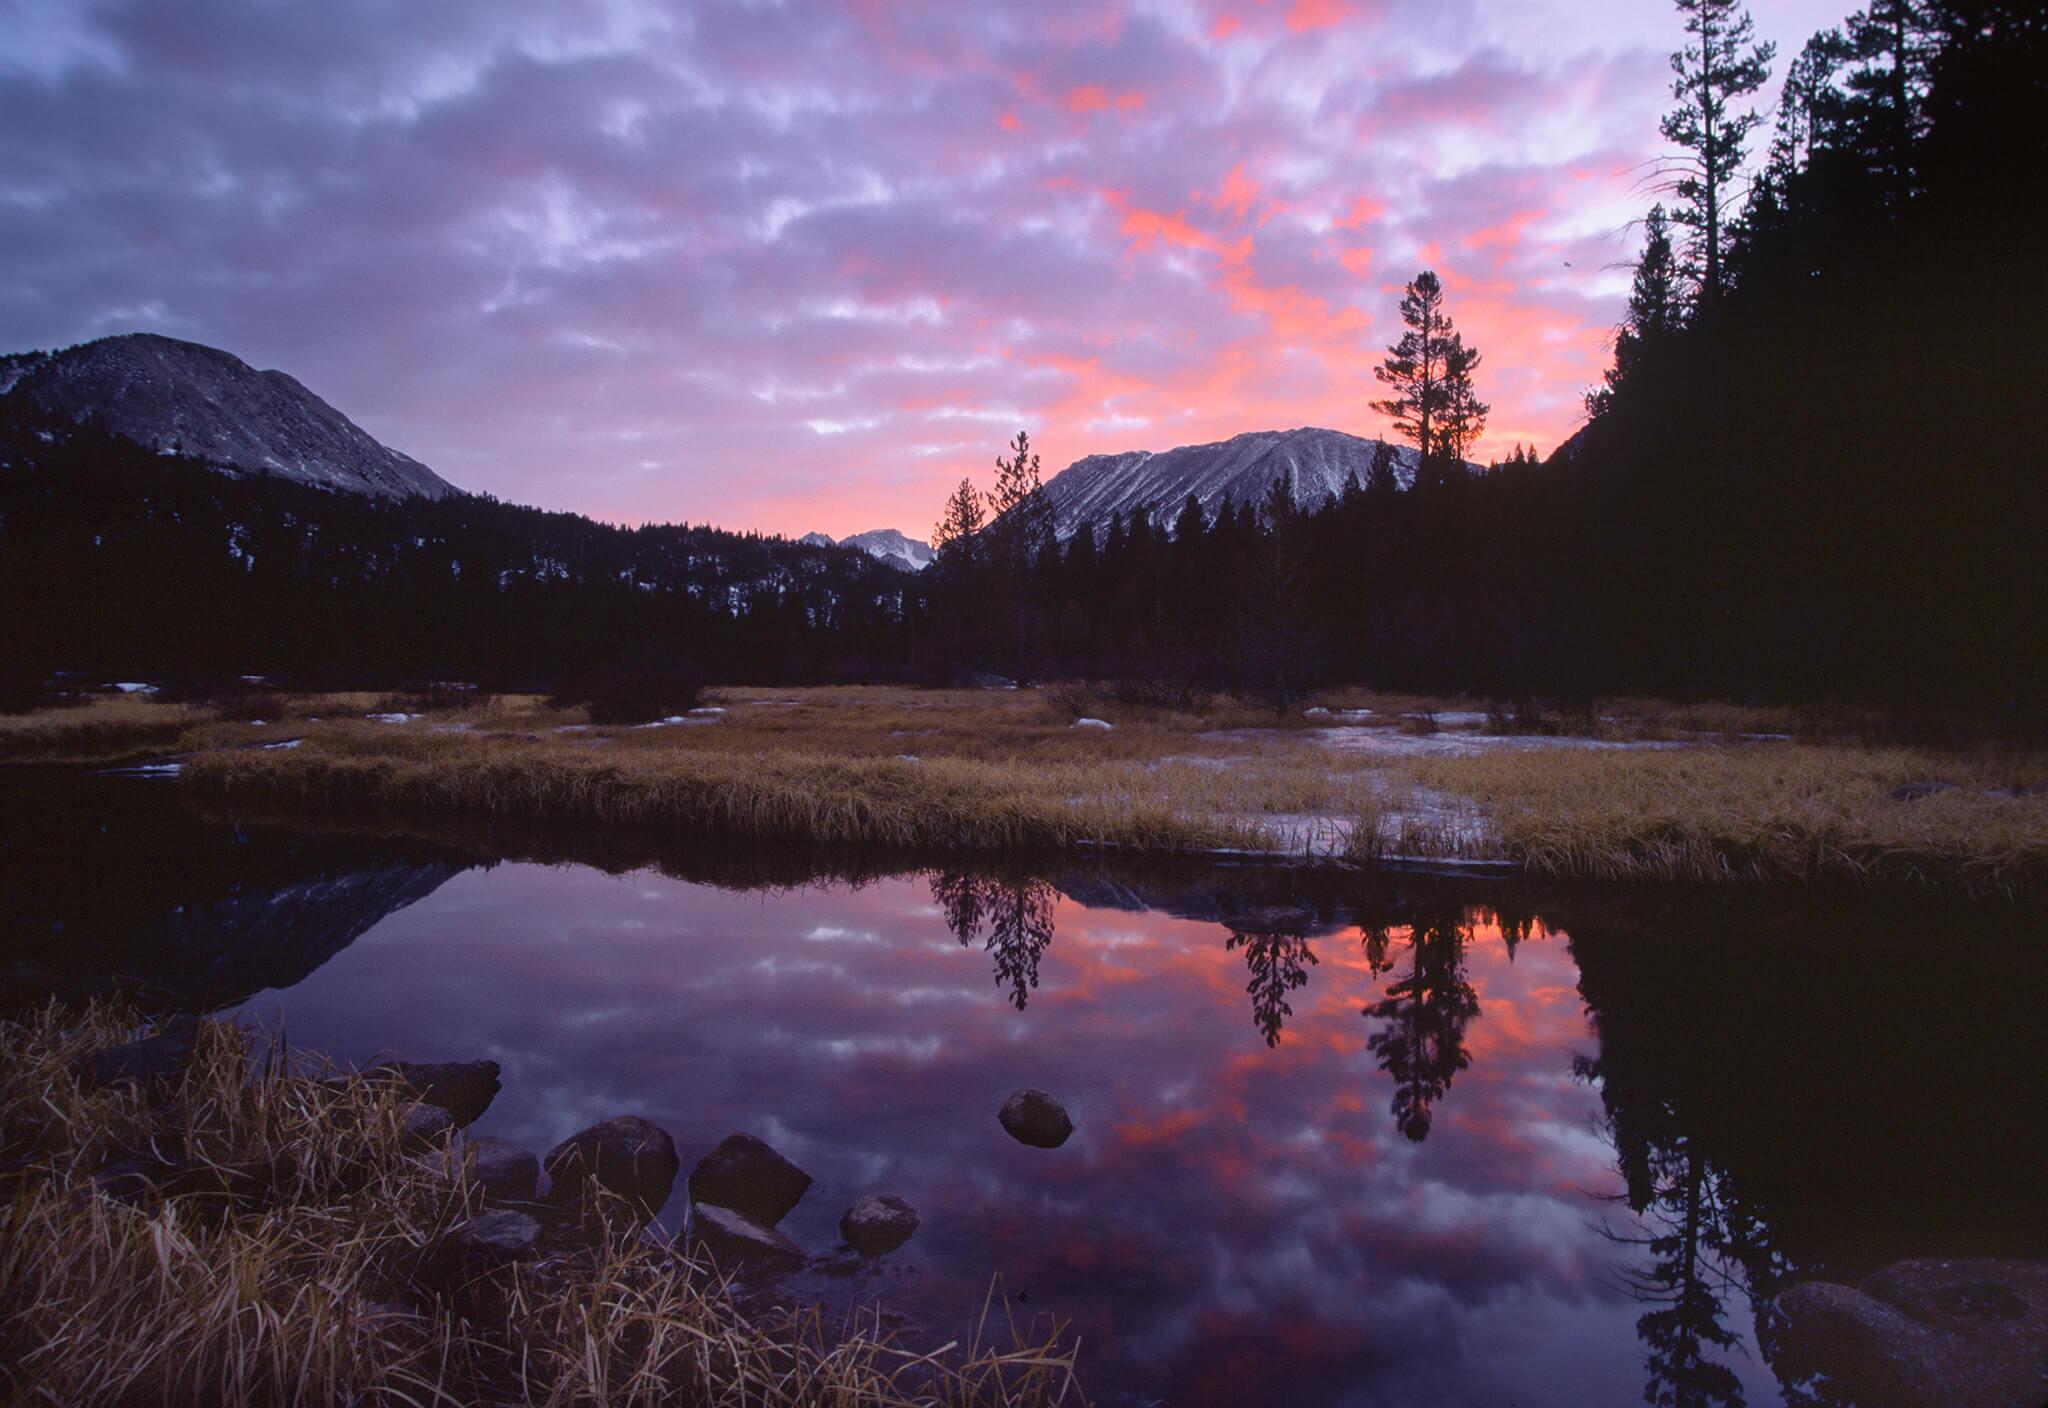 Rock Creek Lodge – Summer Mammoth Mountain Lake Cabins and